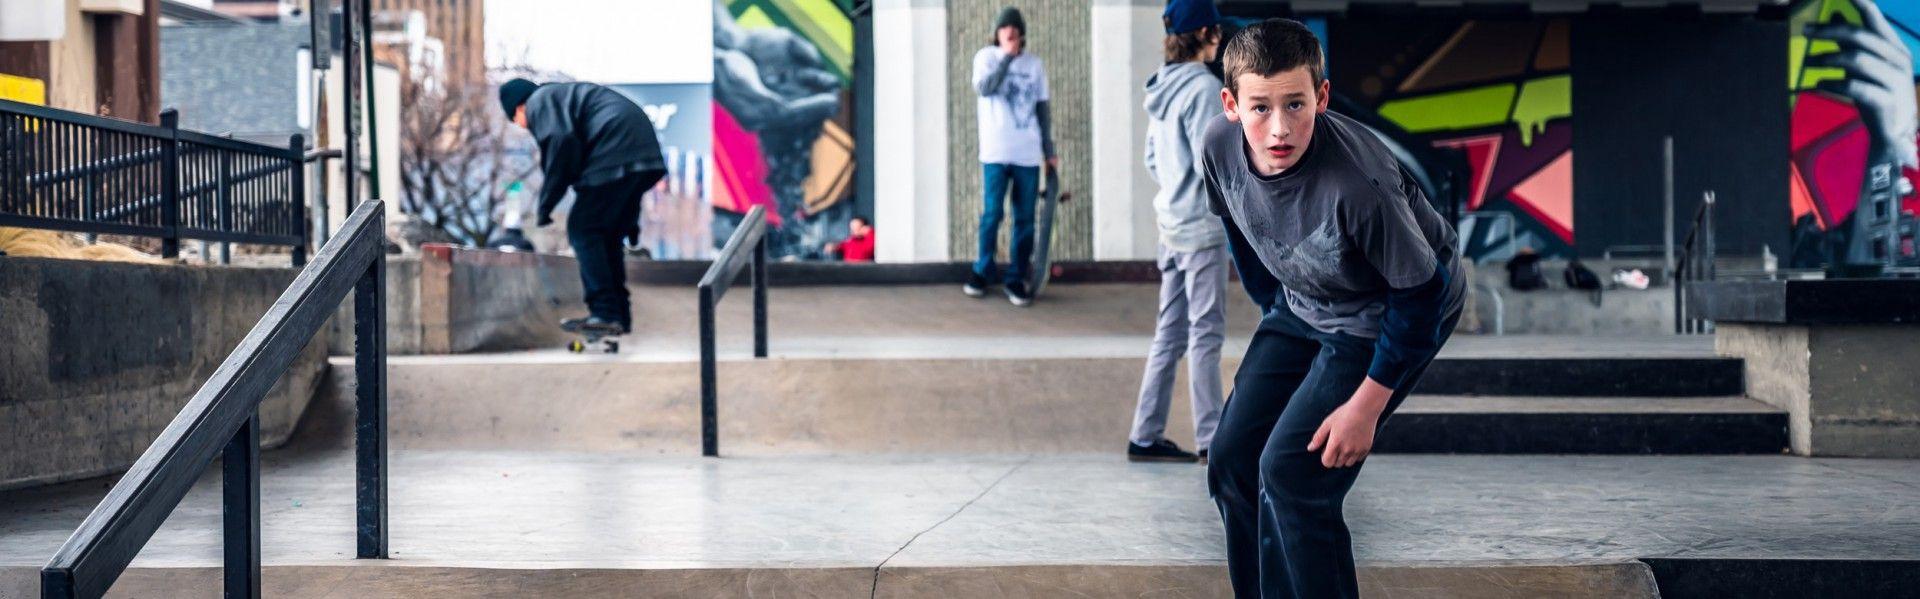 a boy skateboarding